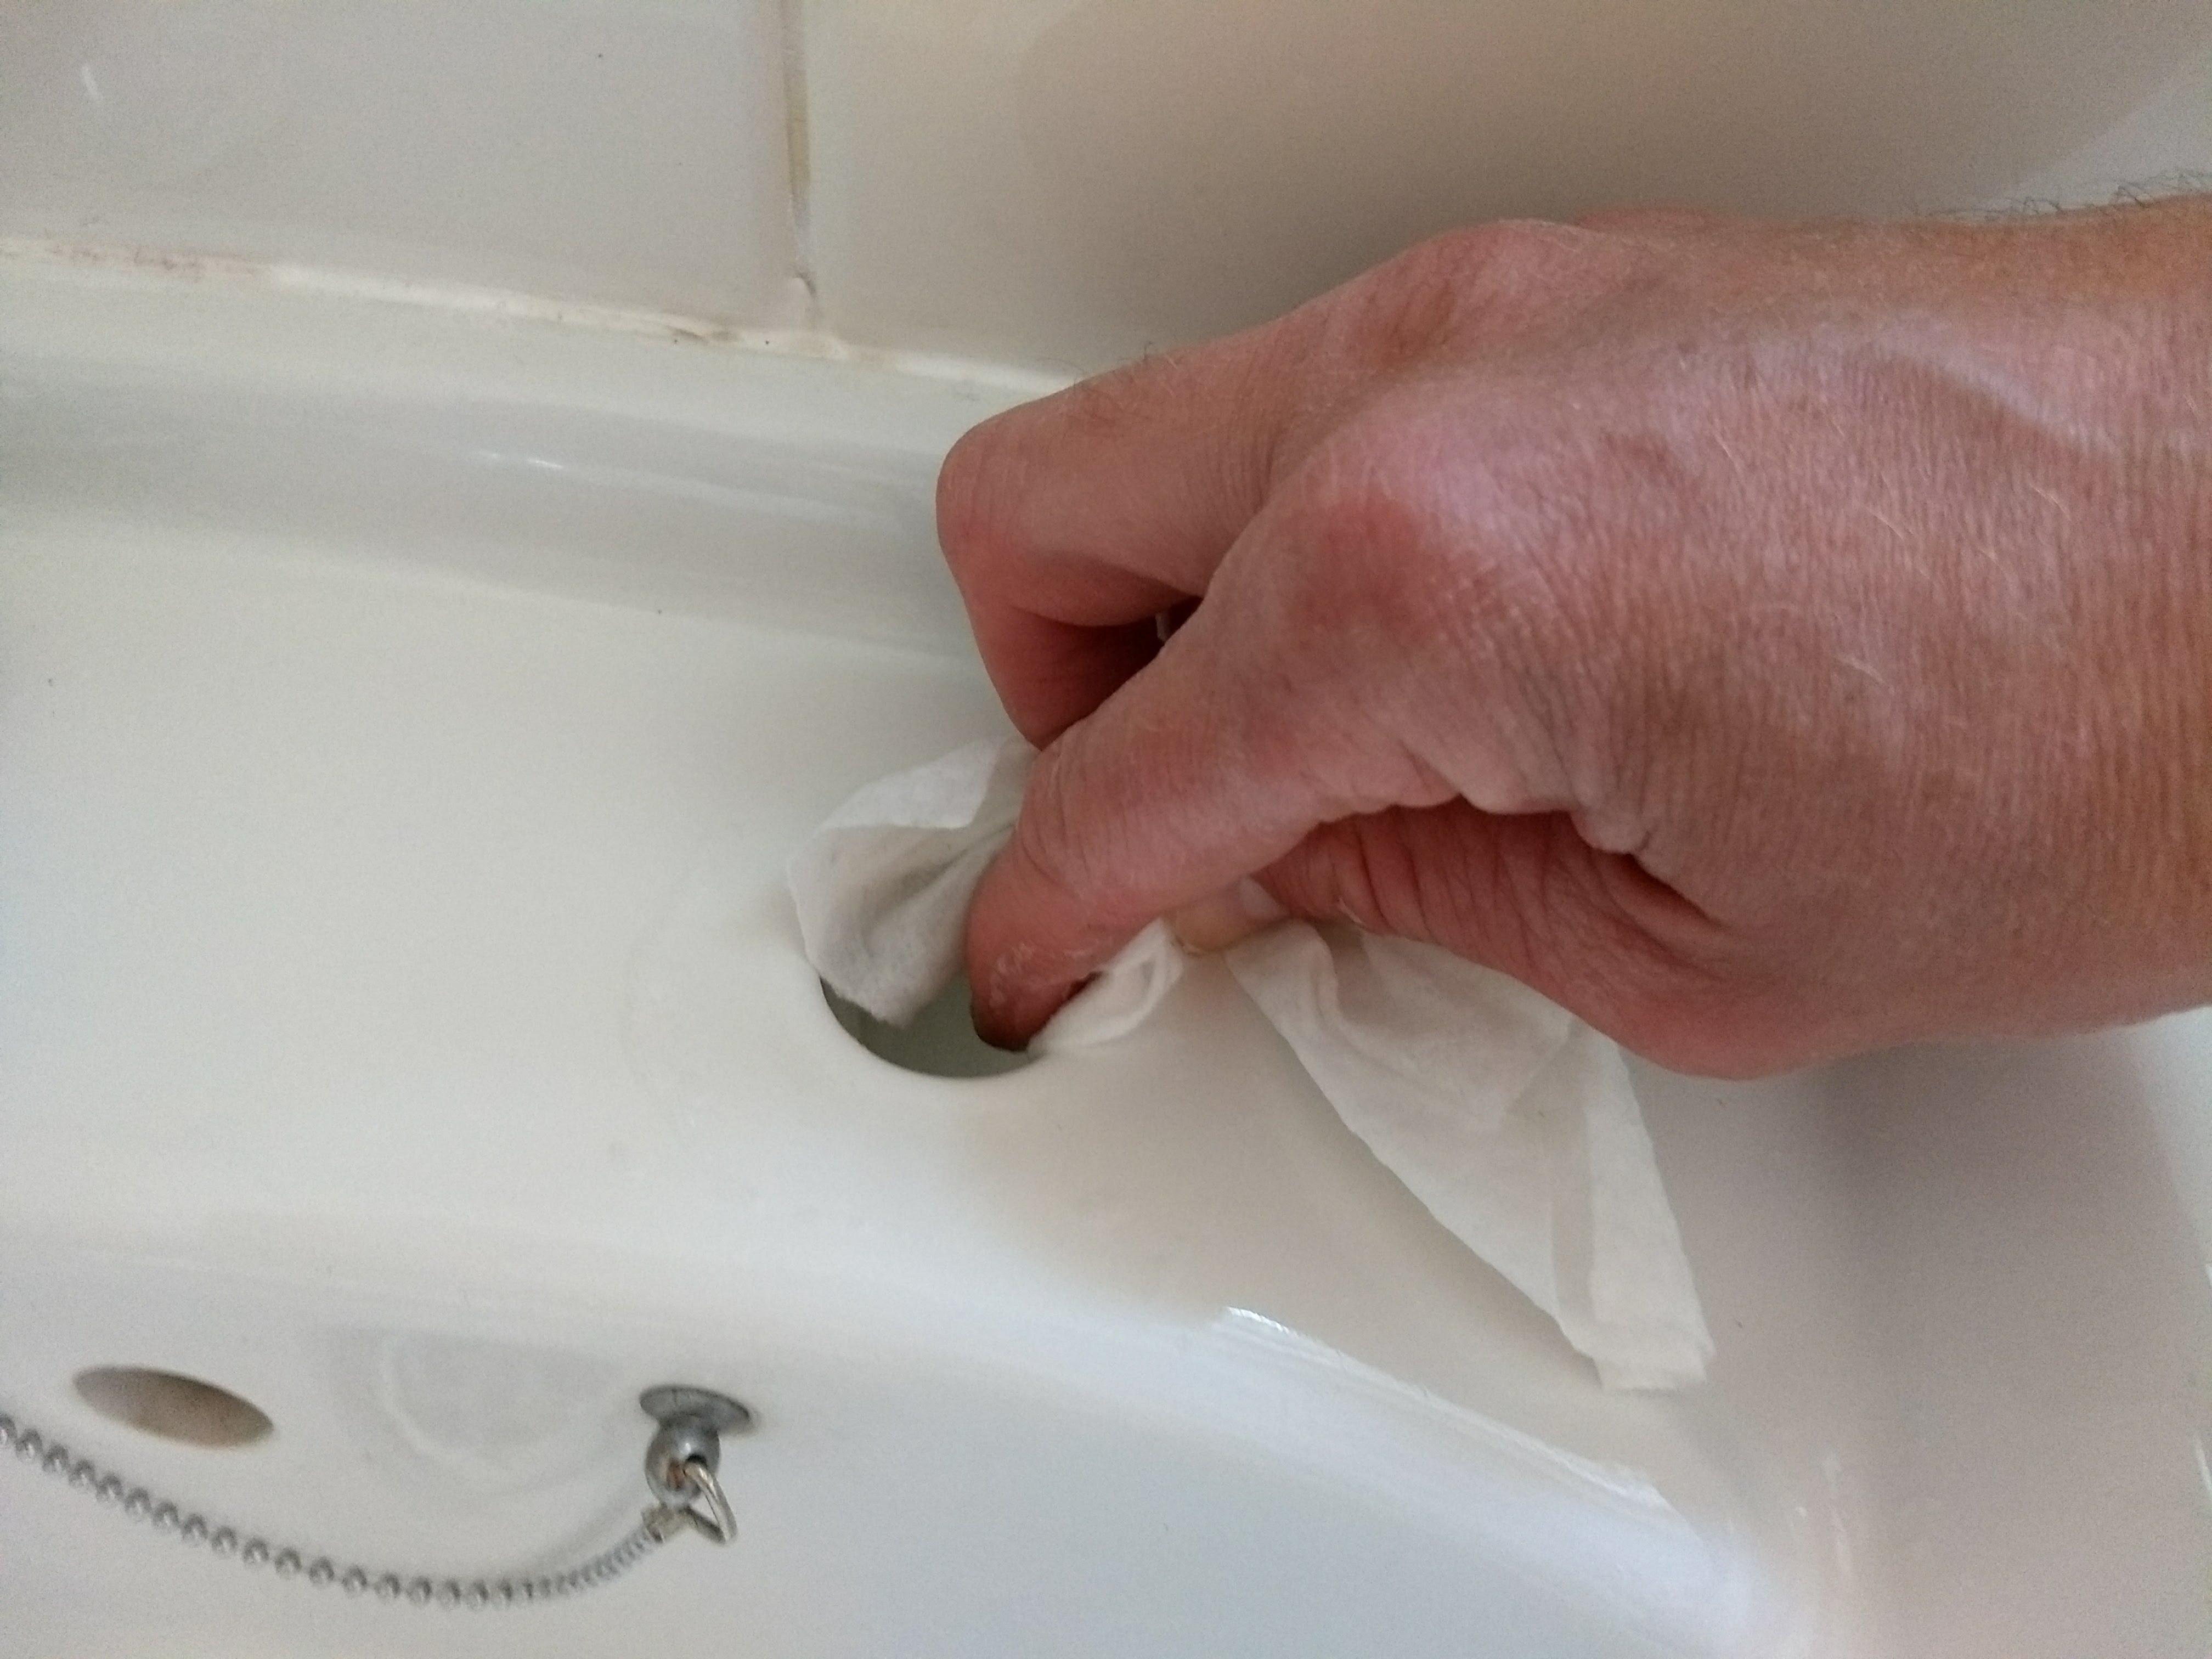 Changing bathroom taps – Little Garage Workshop